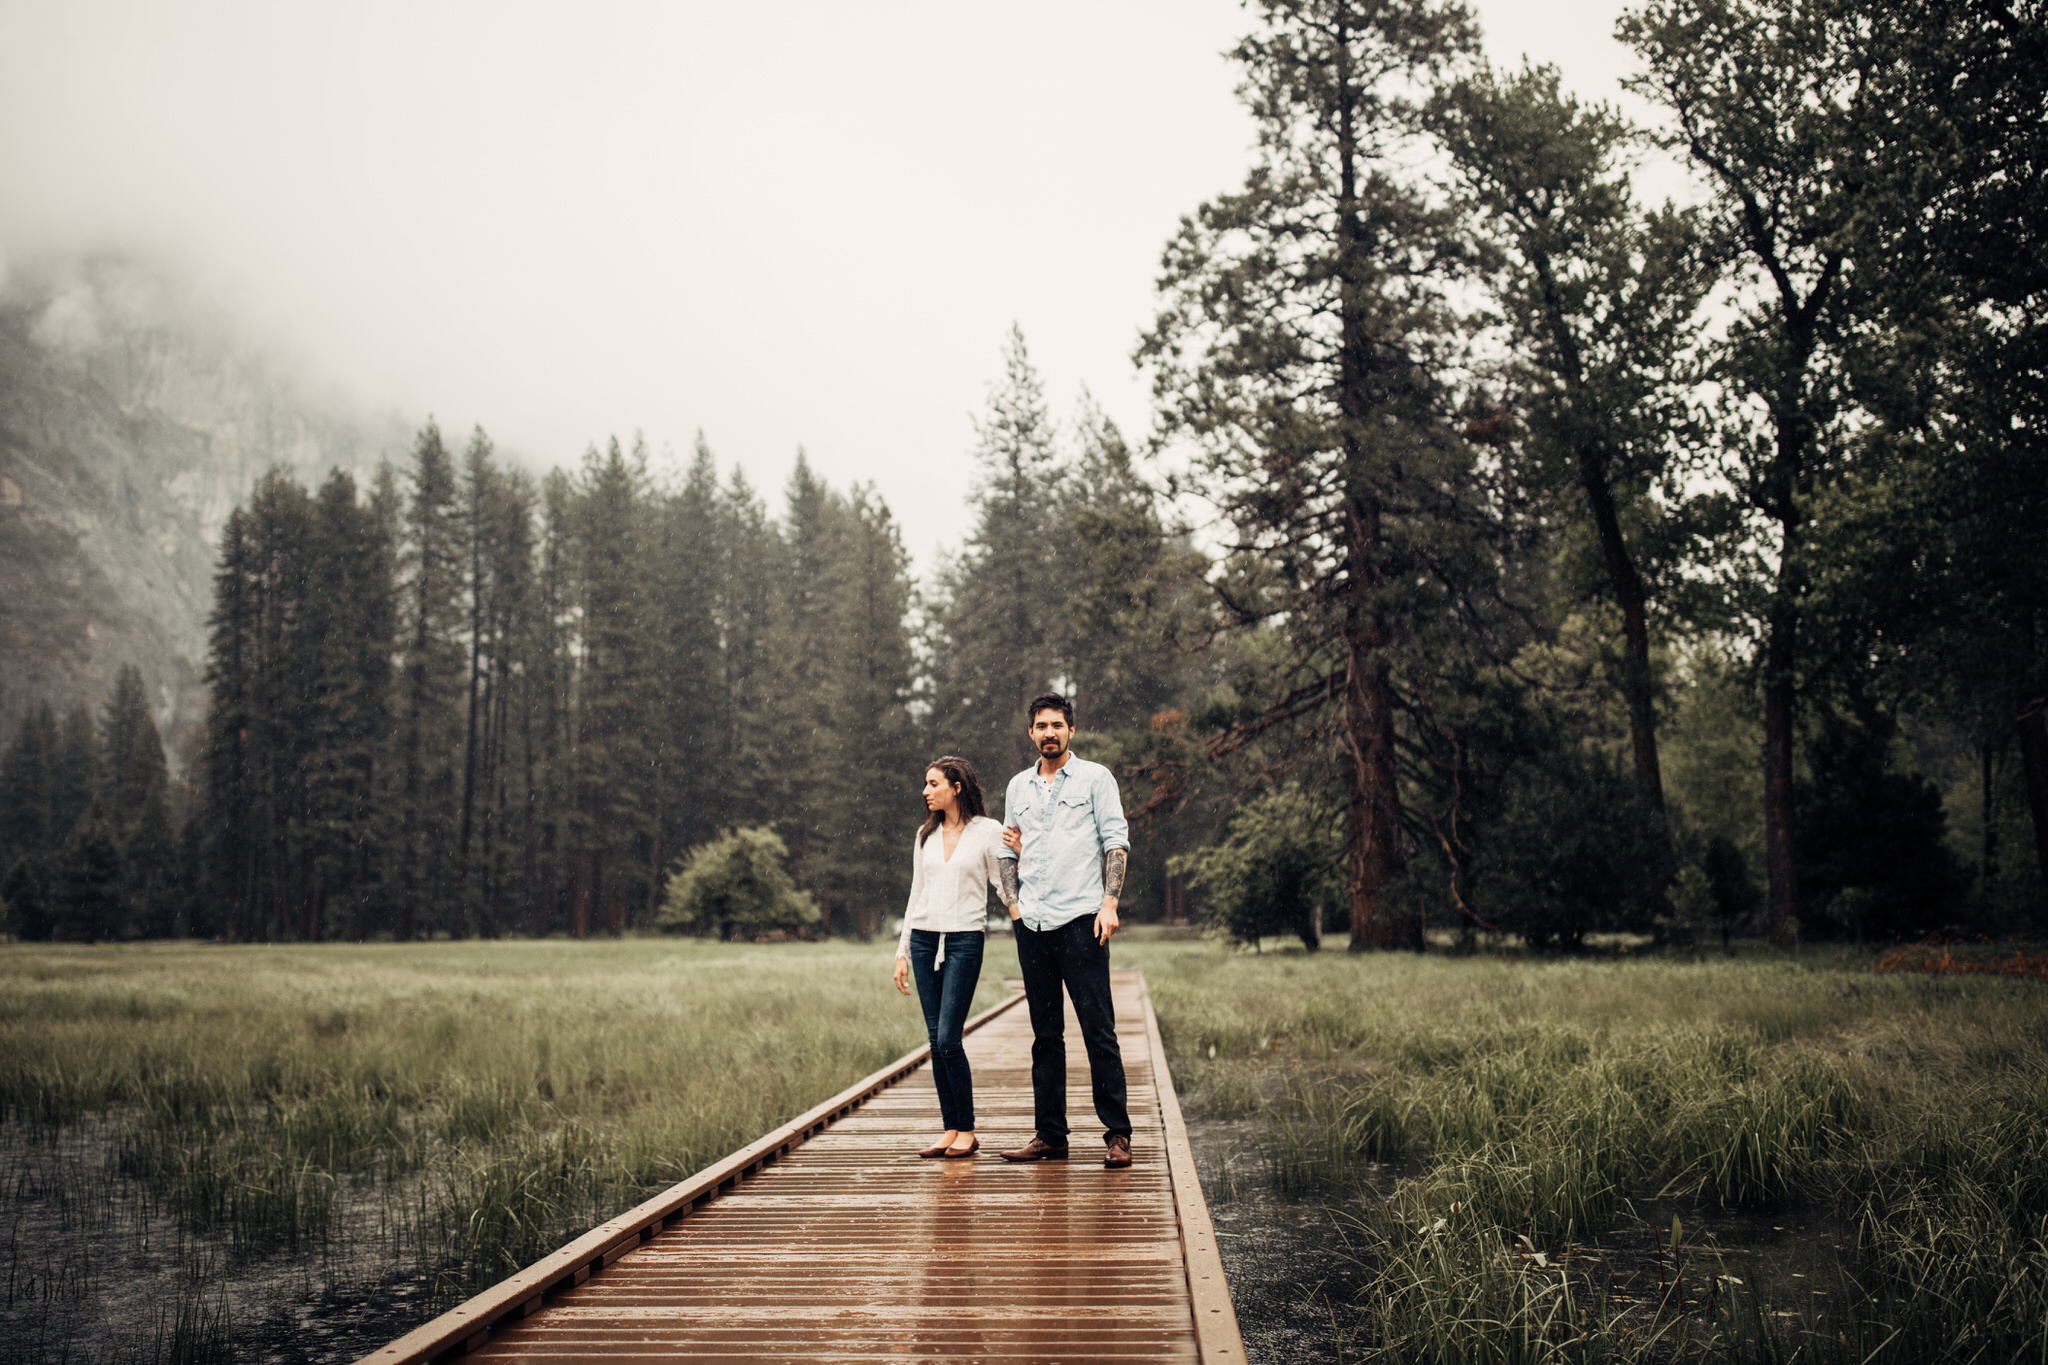 Yosemite-engagement-session-lauren-and-tom13.jpg